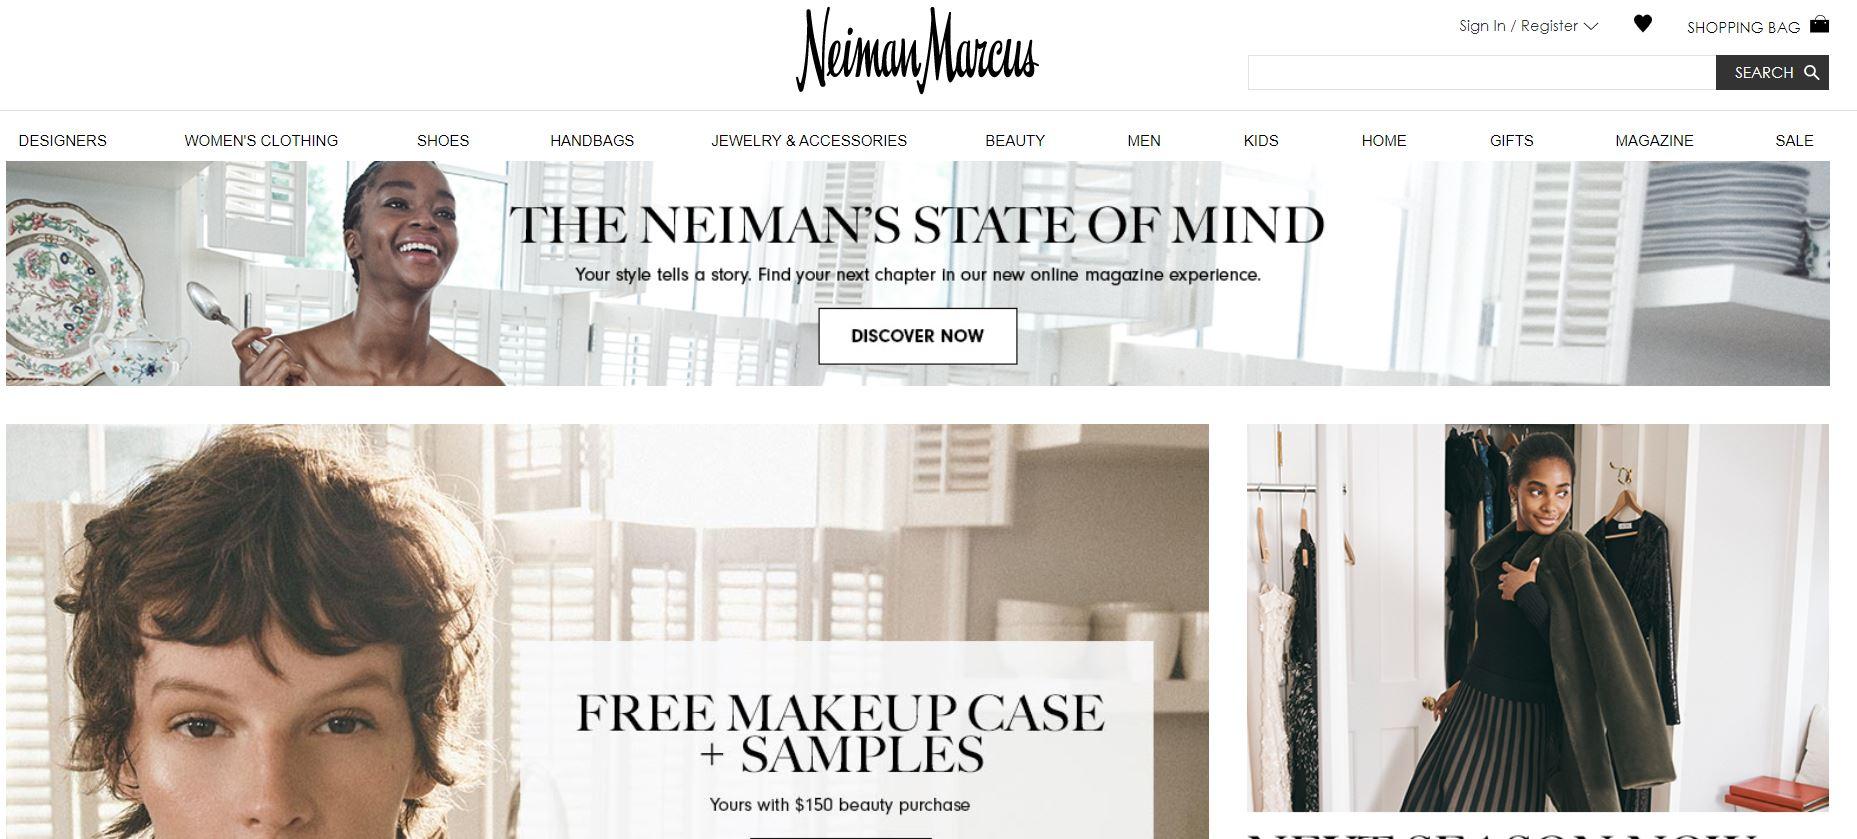 neimanmarcus- 2